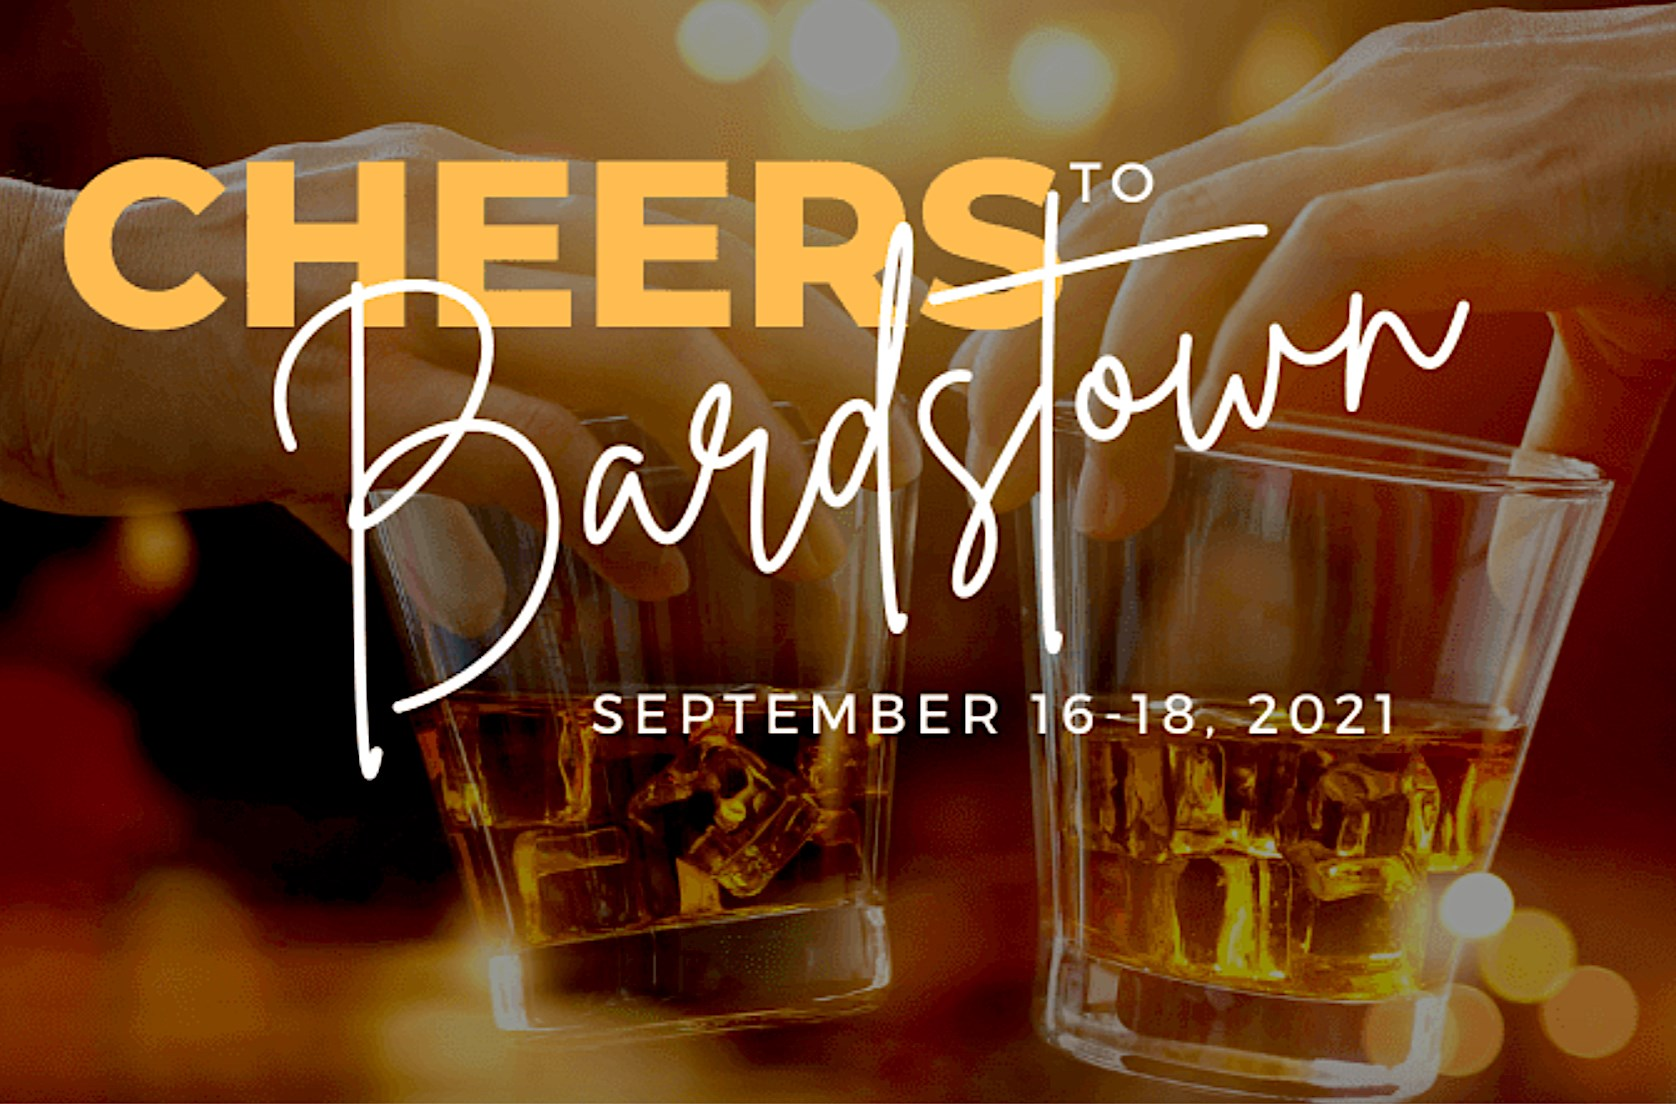 bardsttonw - Cheers to Bardstown